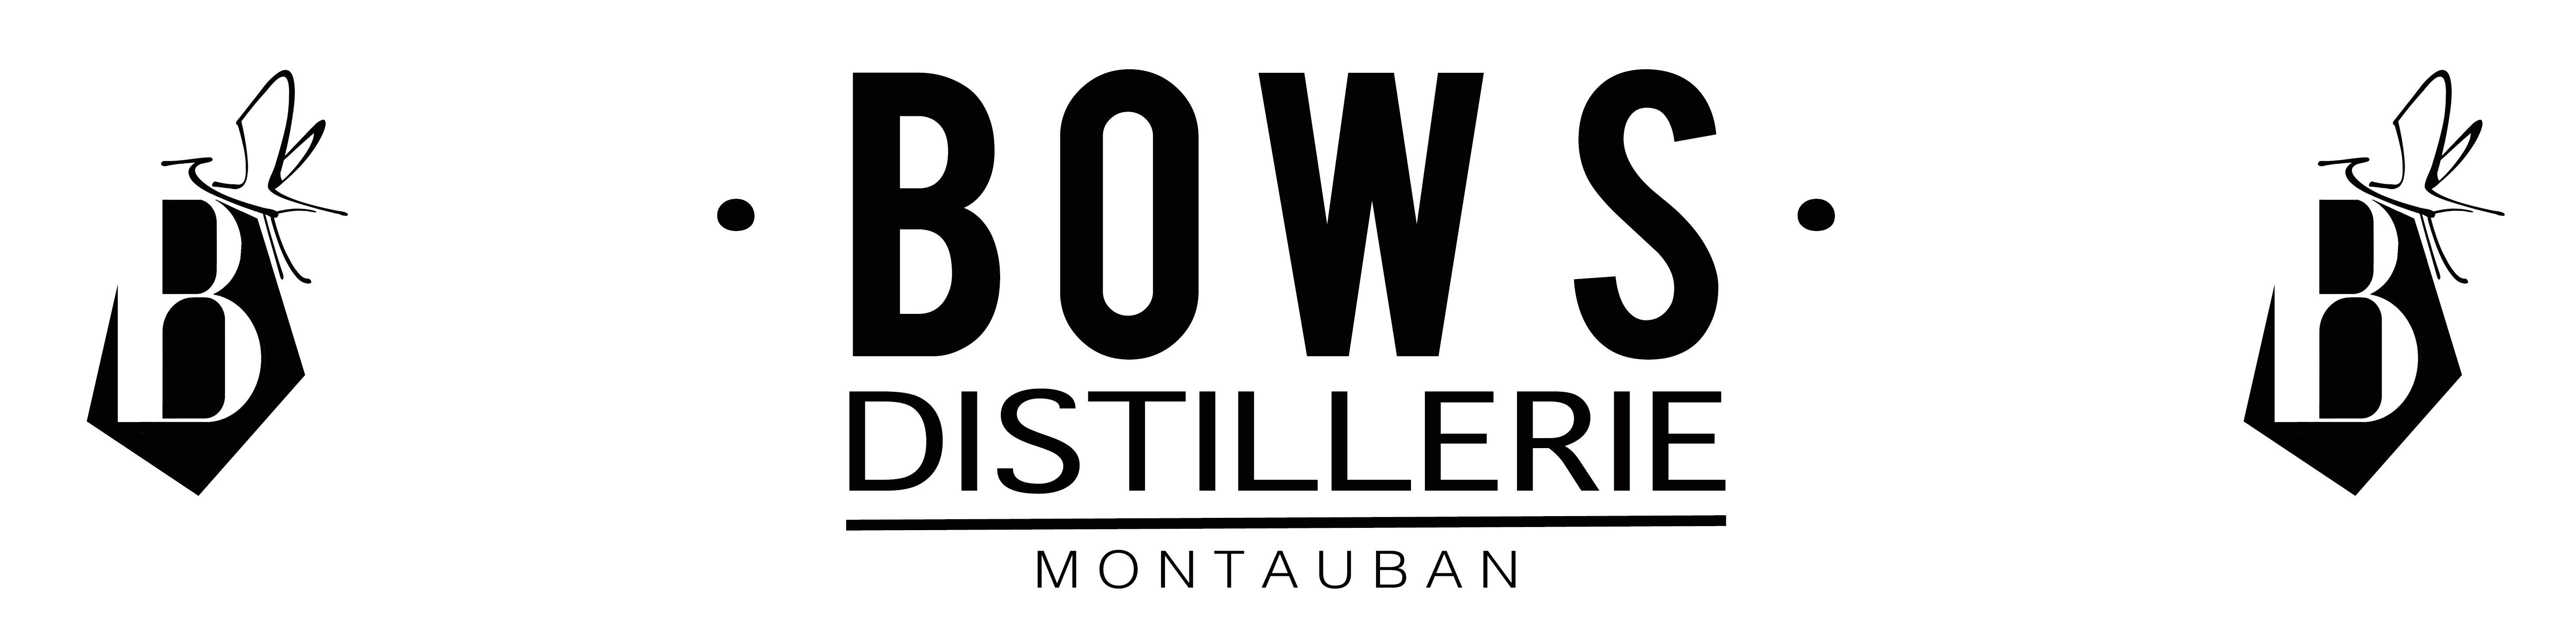 Bows Distillerie à Montauban